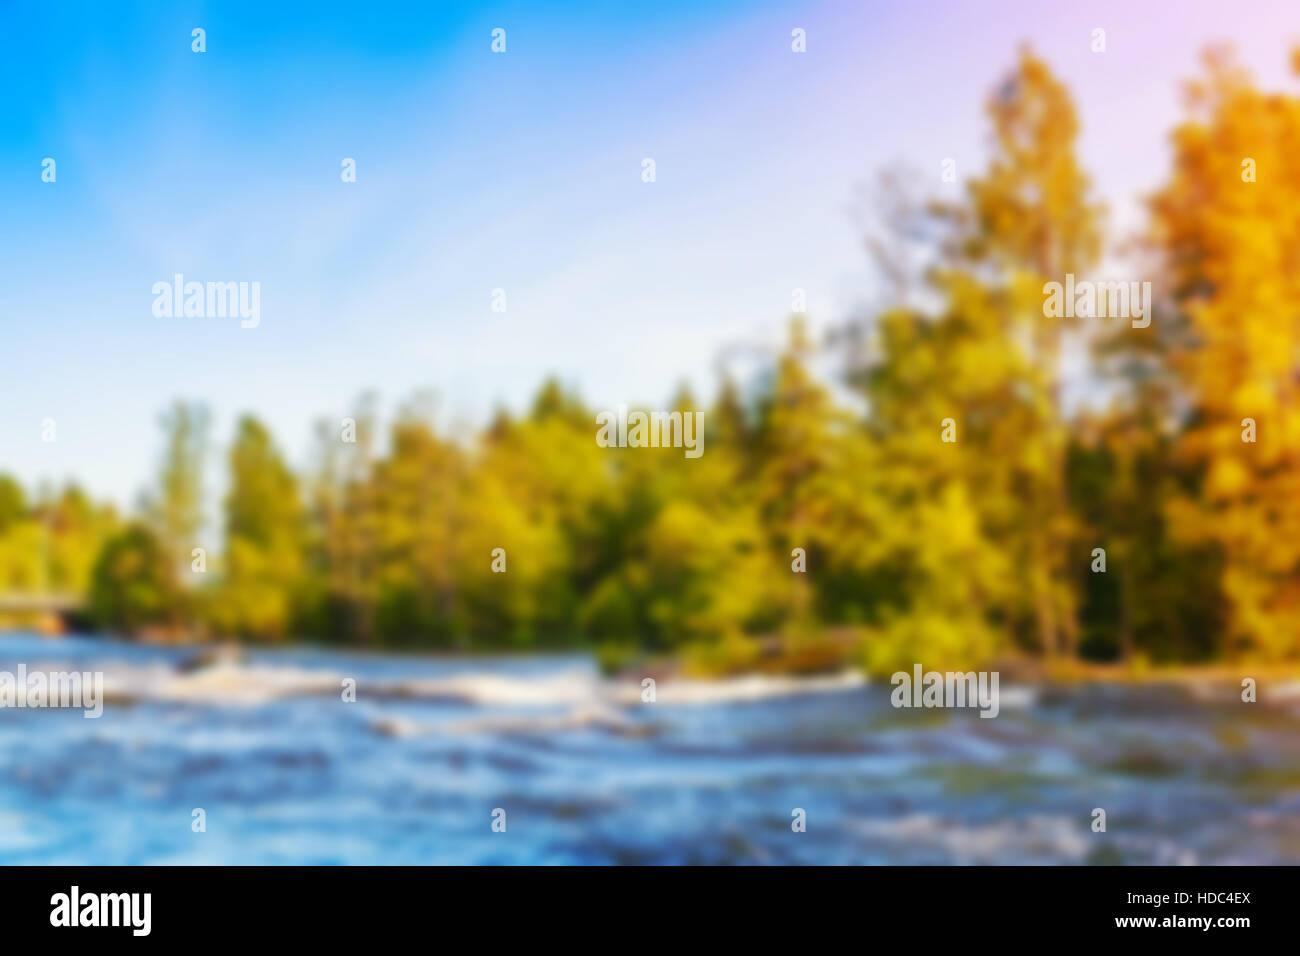 blurred beautiful natural landscape - photo #37